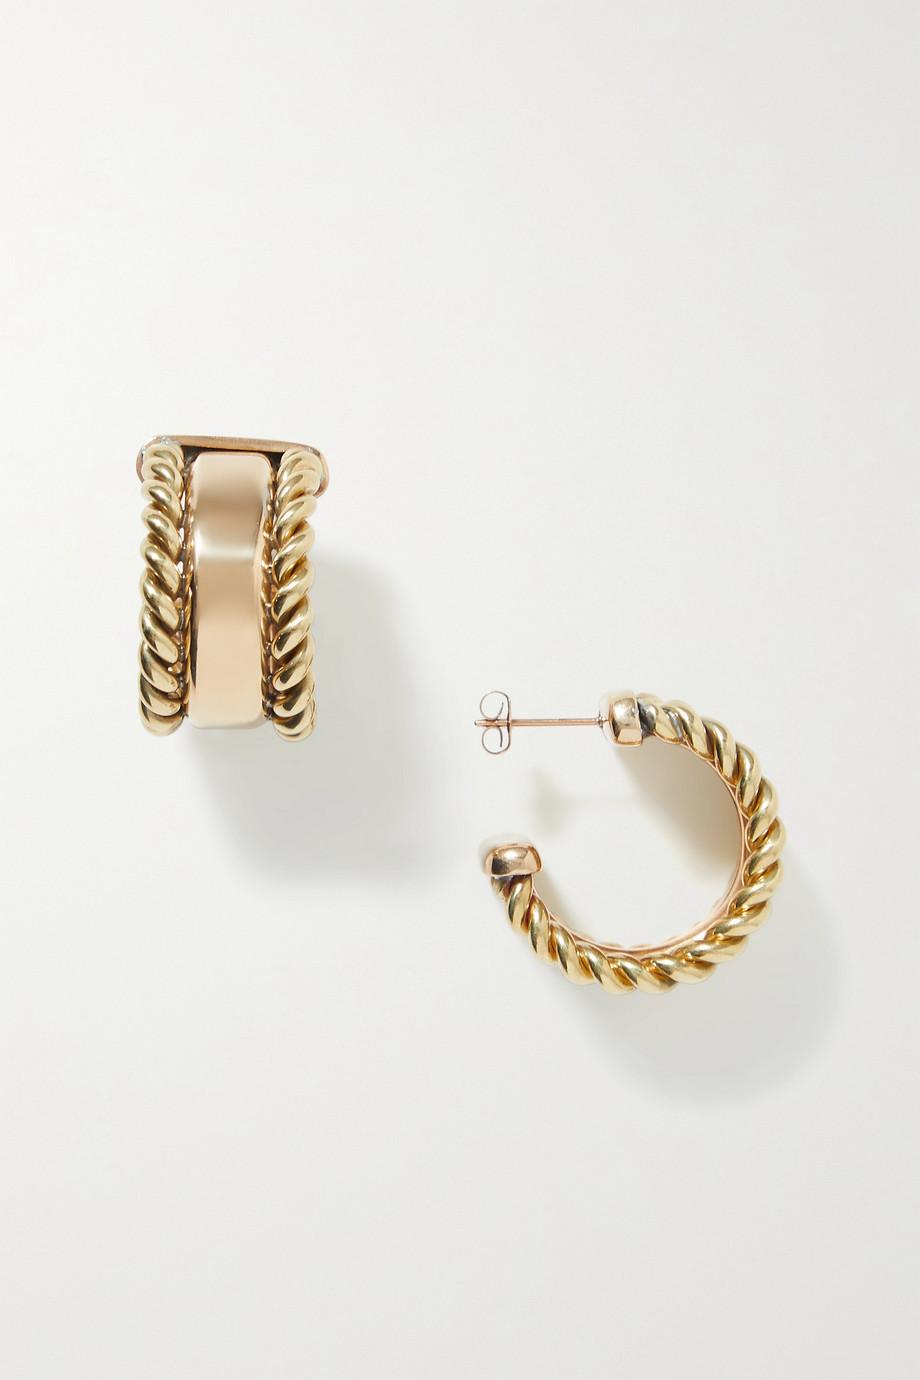 Laura Lombardi Doppia gold-plated hoop earrings